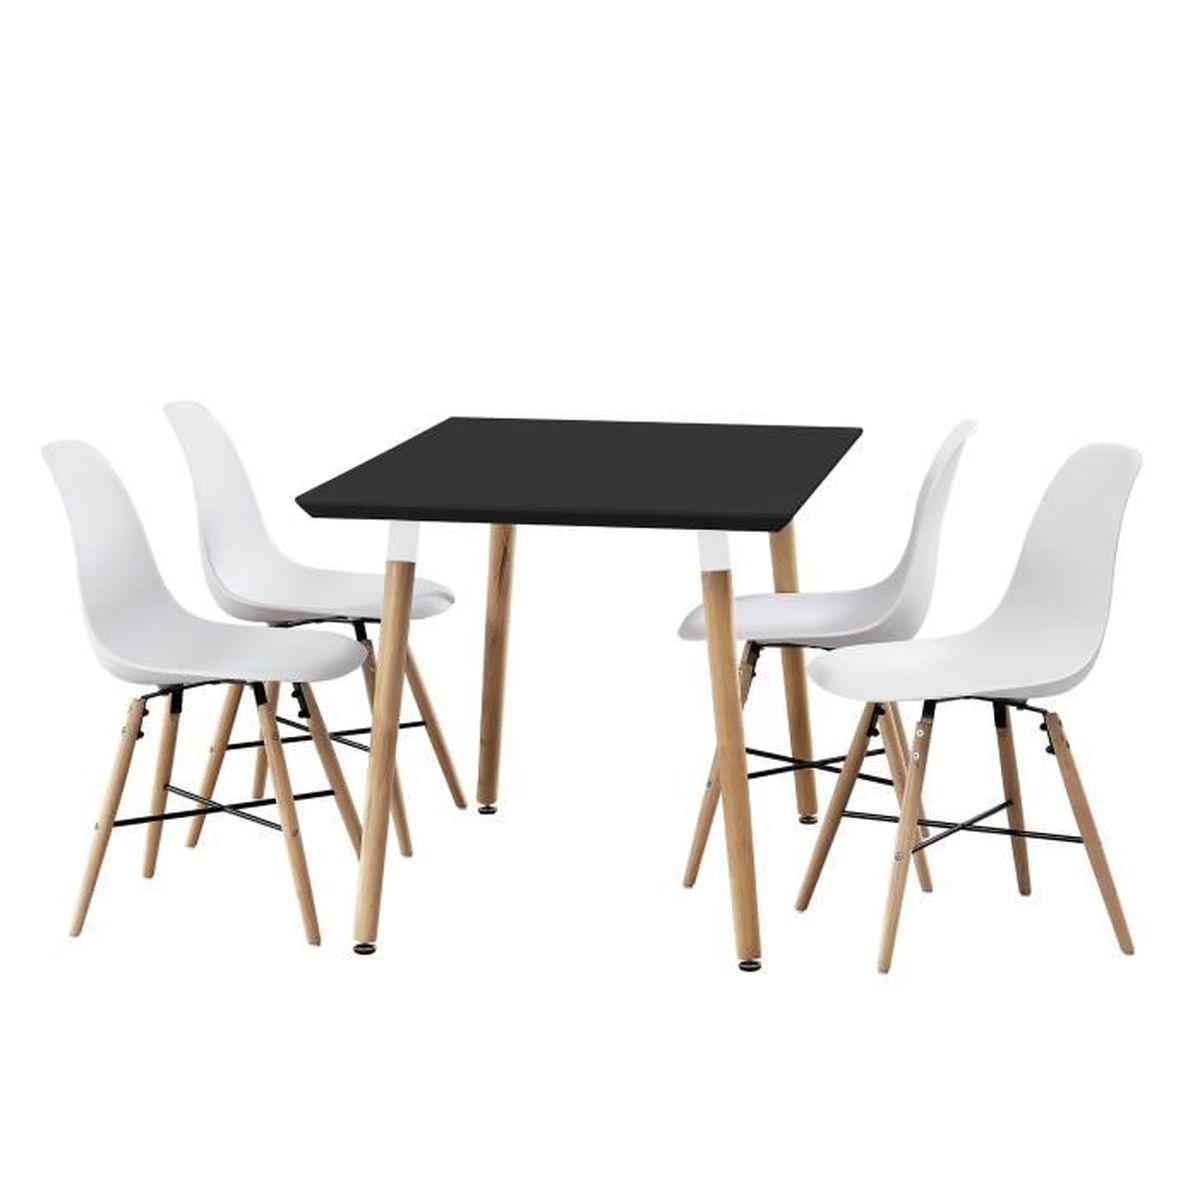 Table de salle manger bambou avec 4 chaises for Salle a manger sims 4